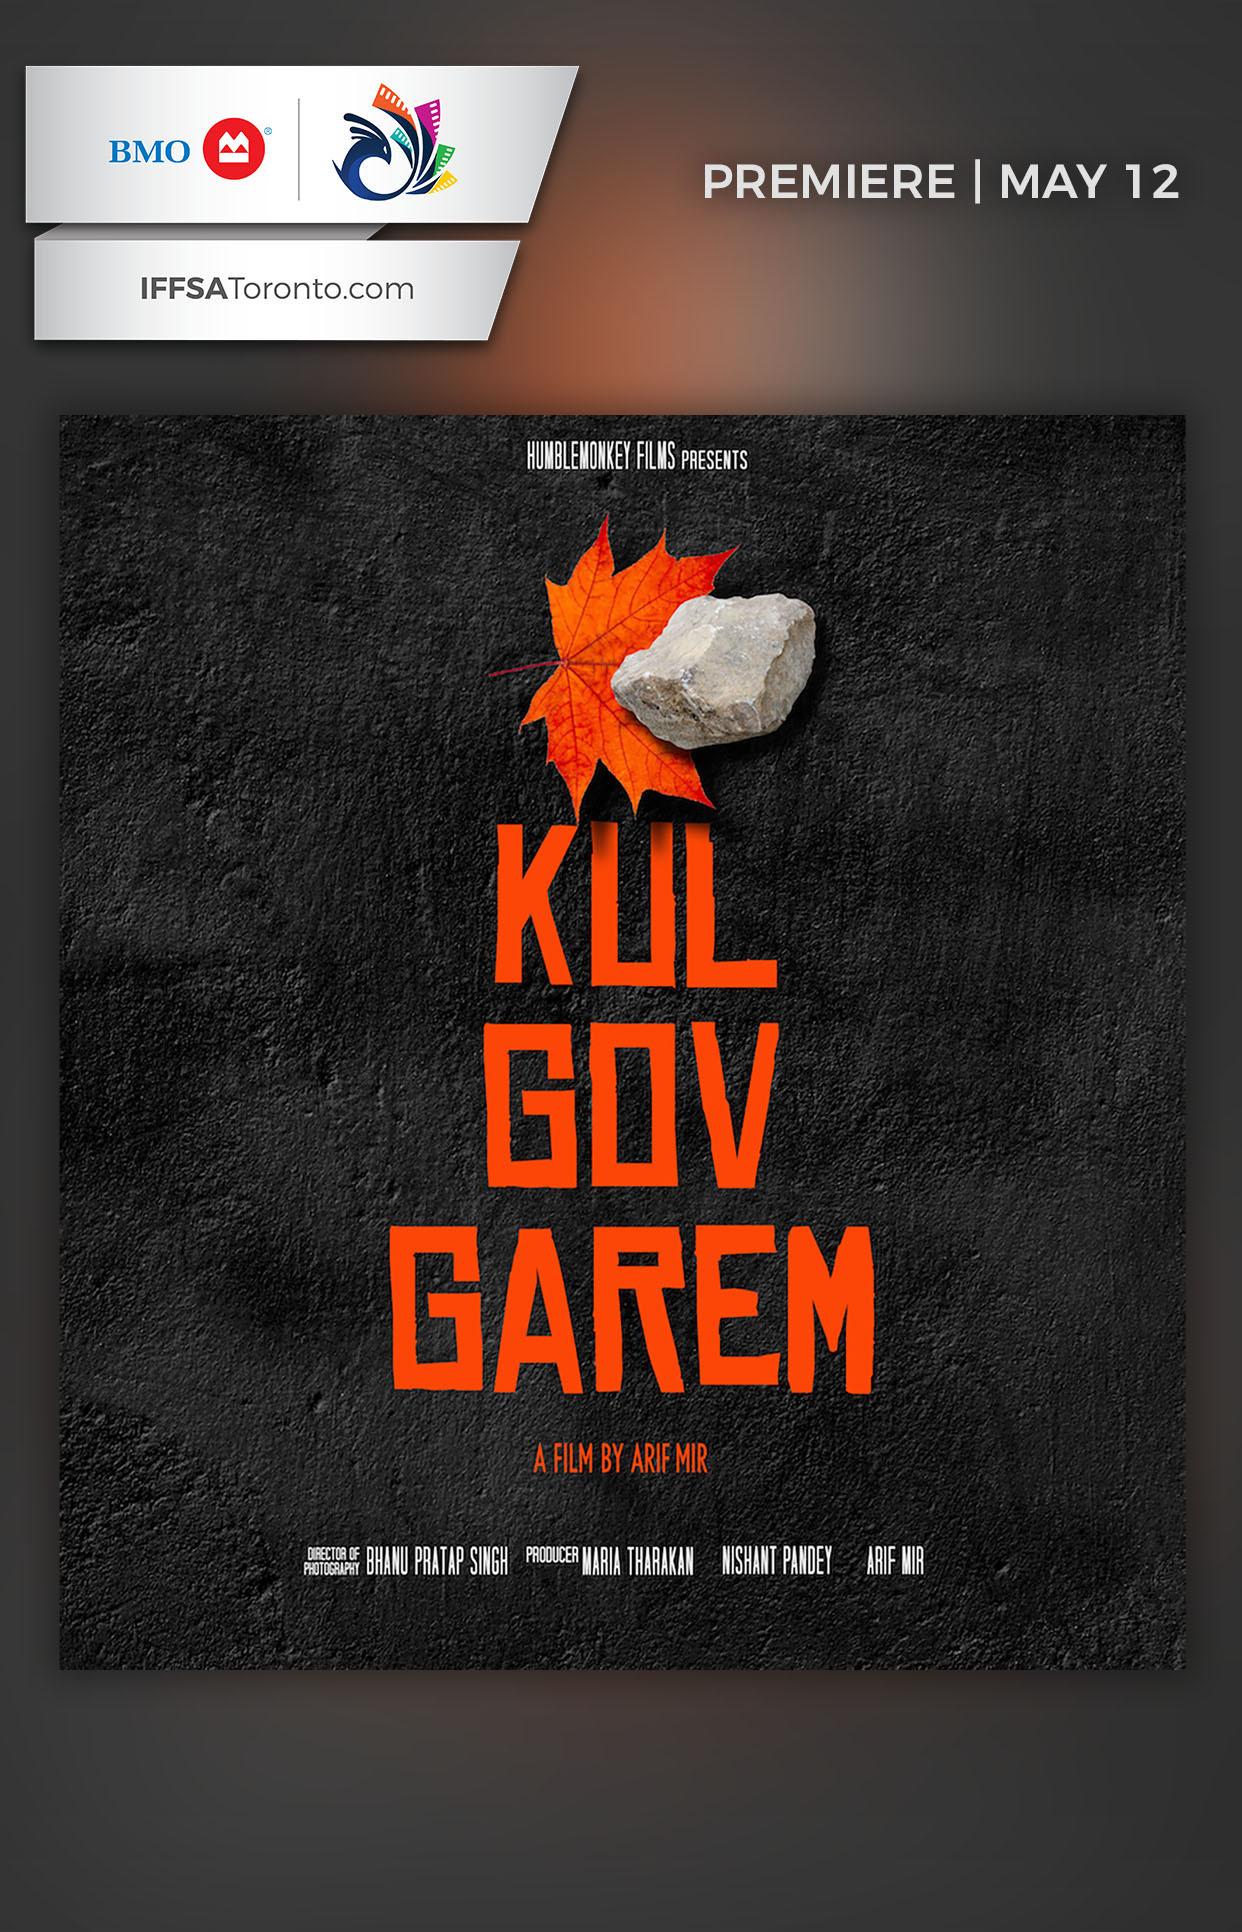 KUL GOV GAREM